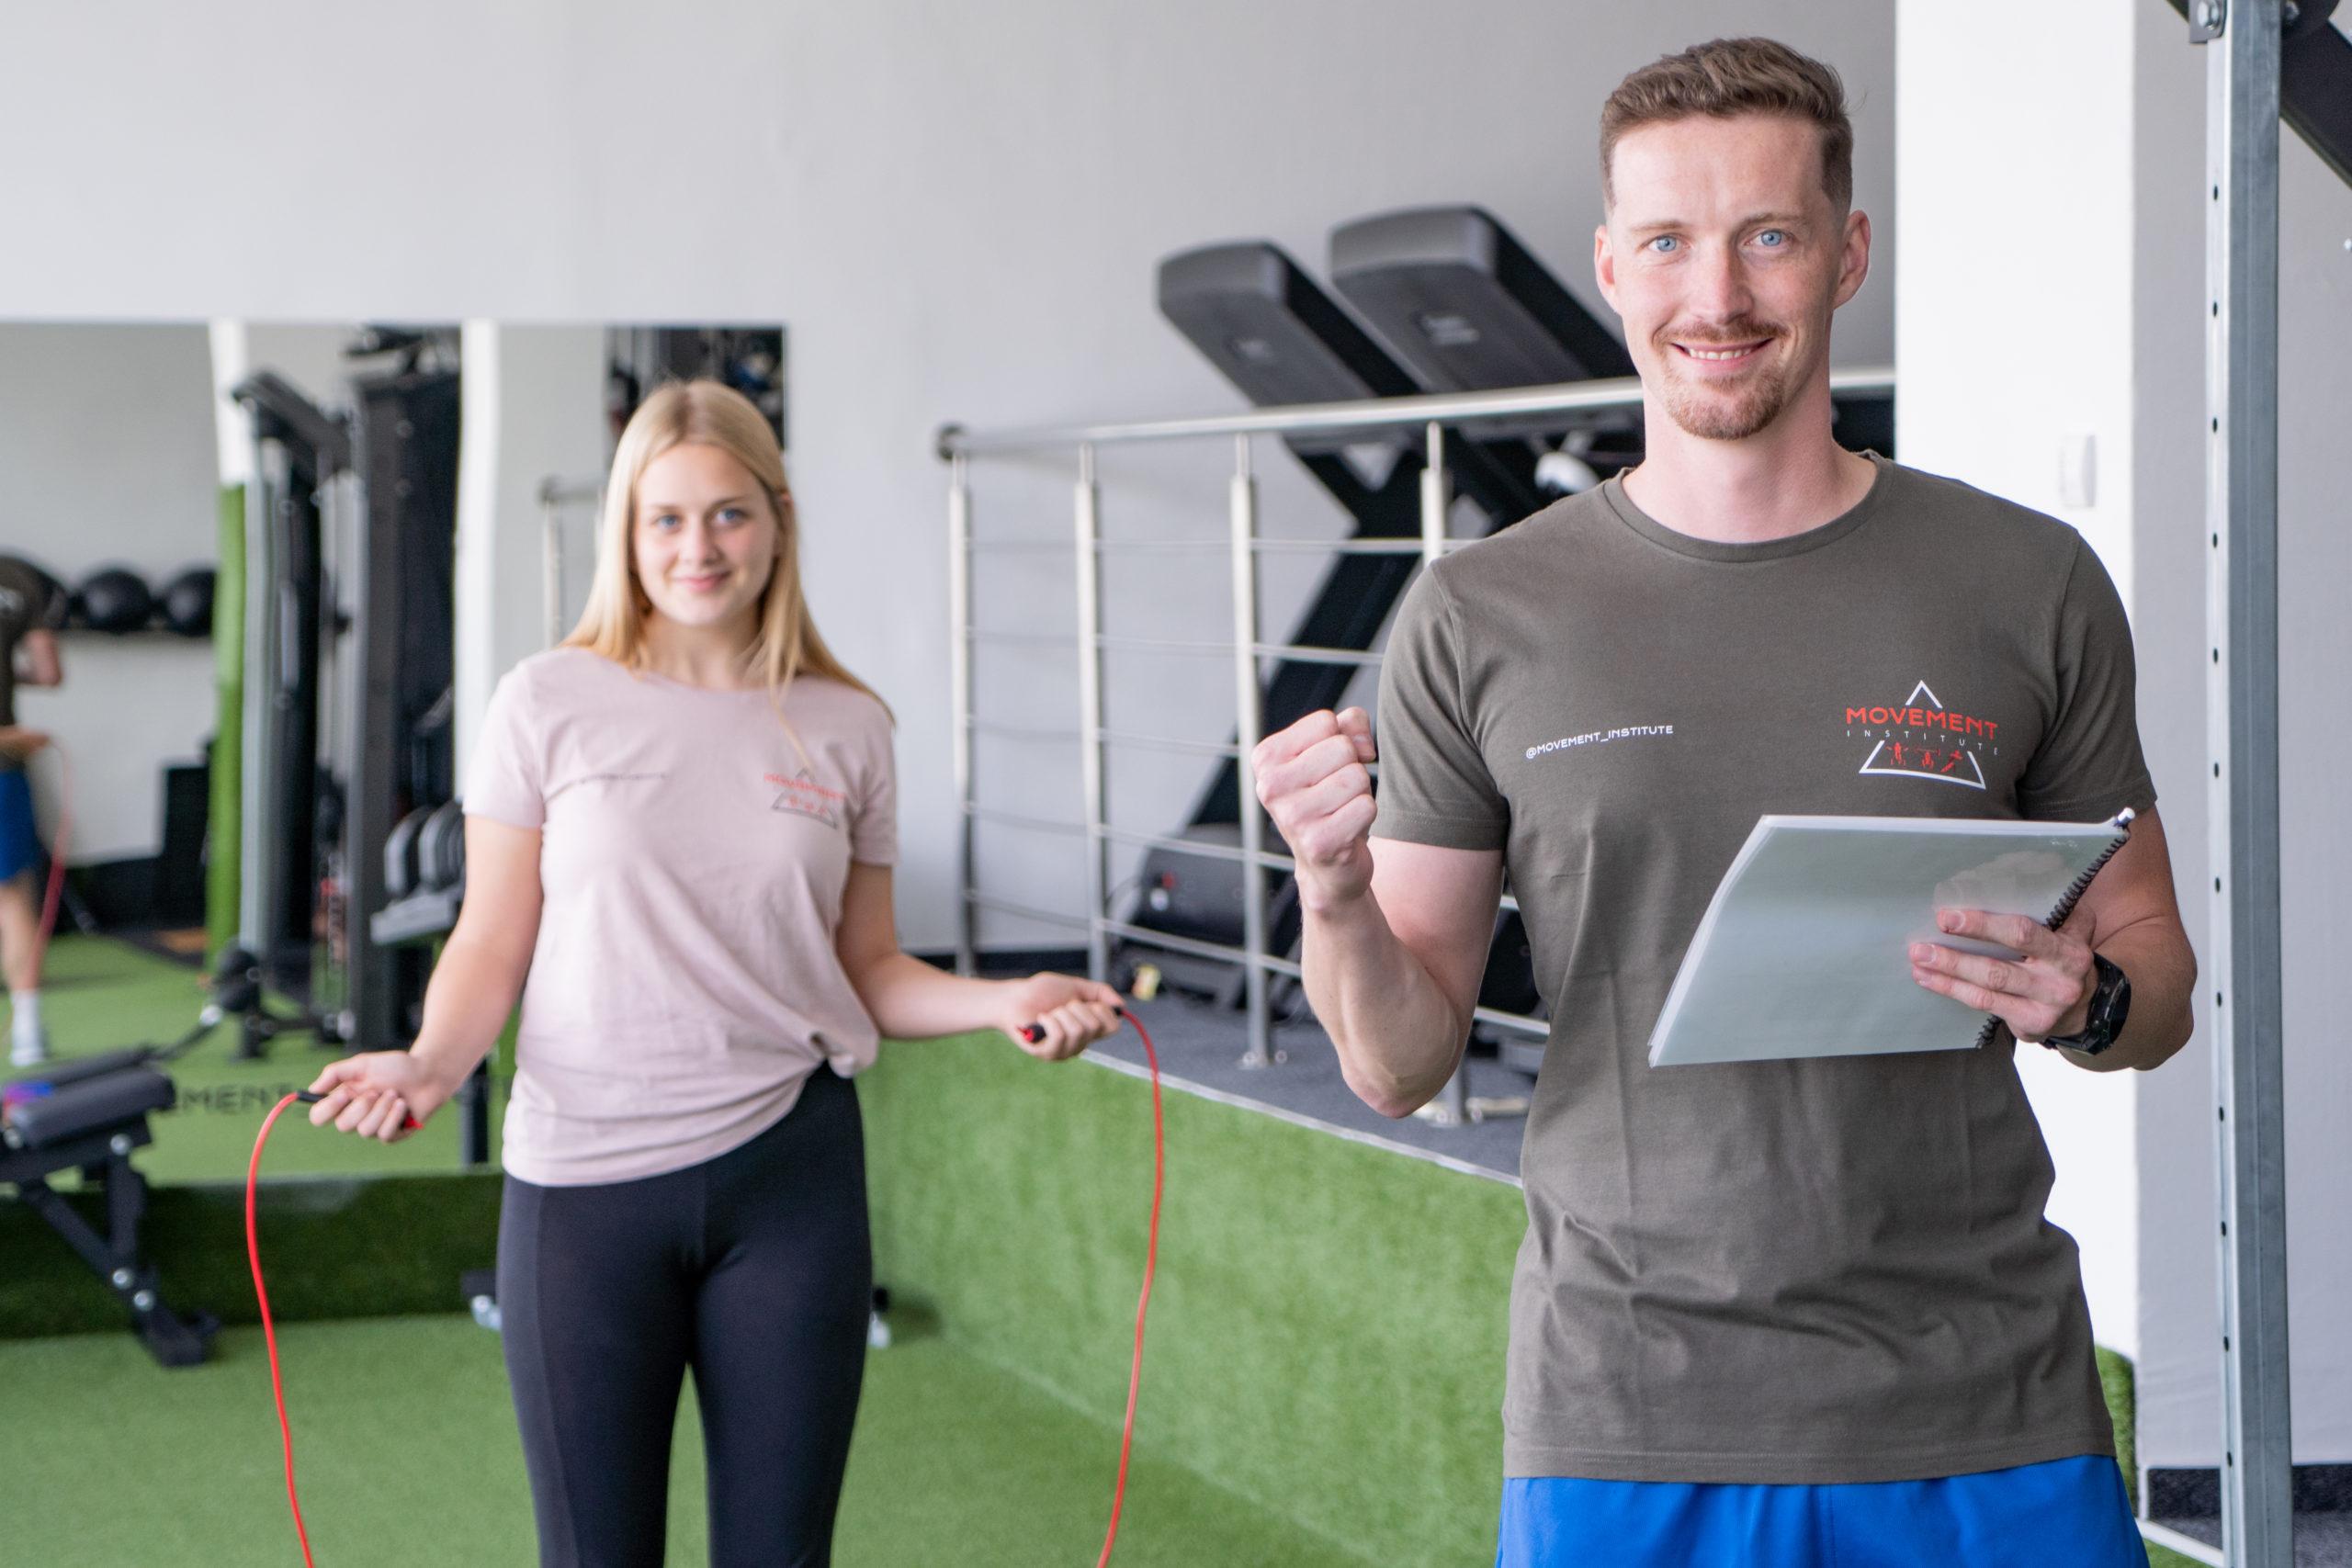 osobný tréner fitness centrum individuálny prístup tréningový plán Movement institute